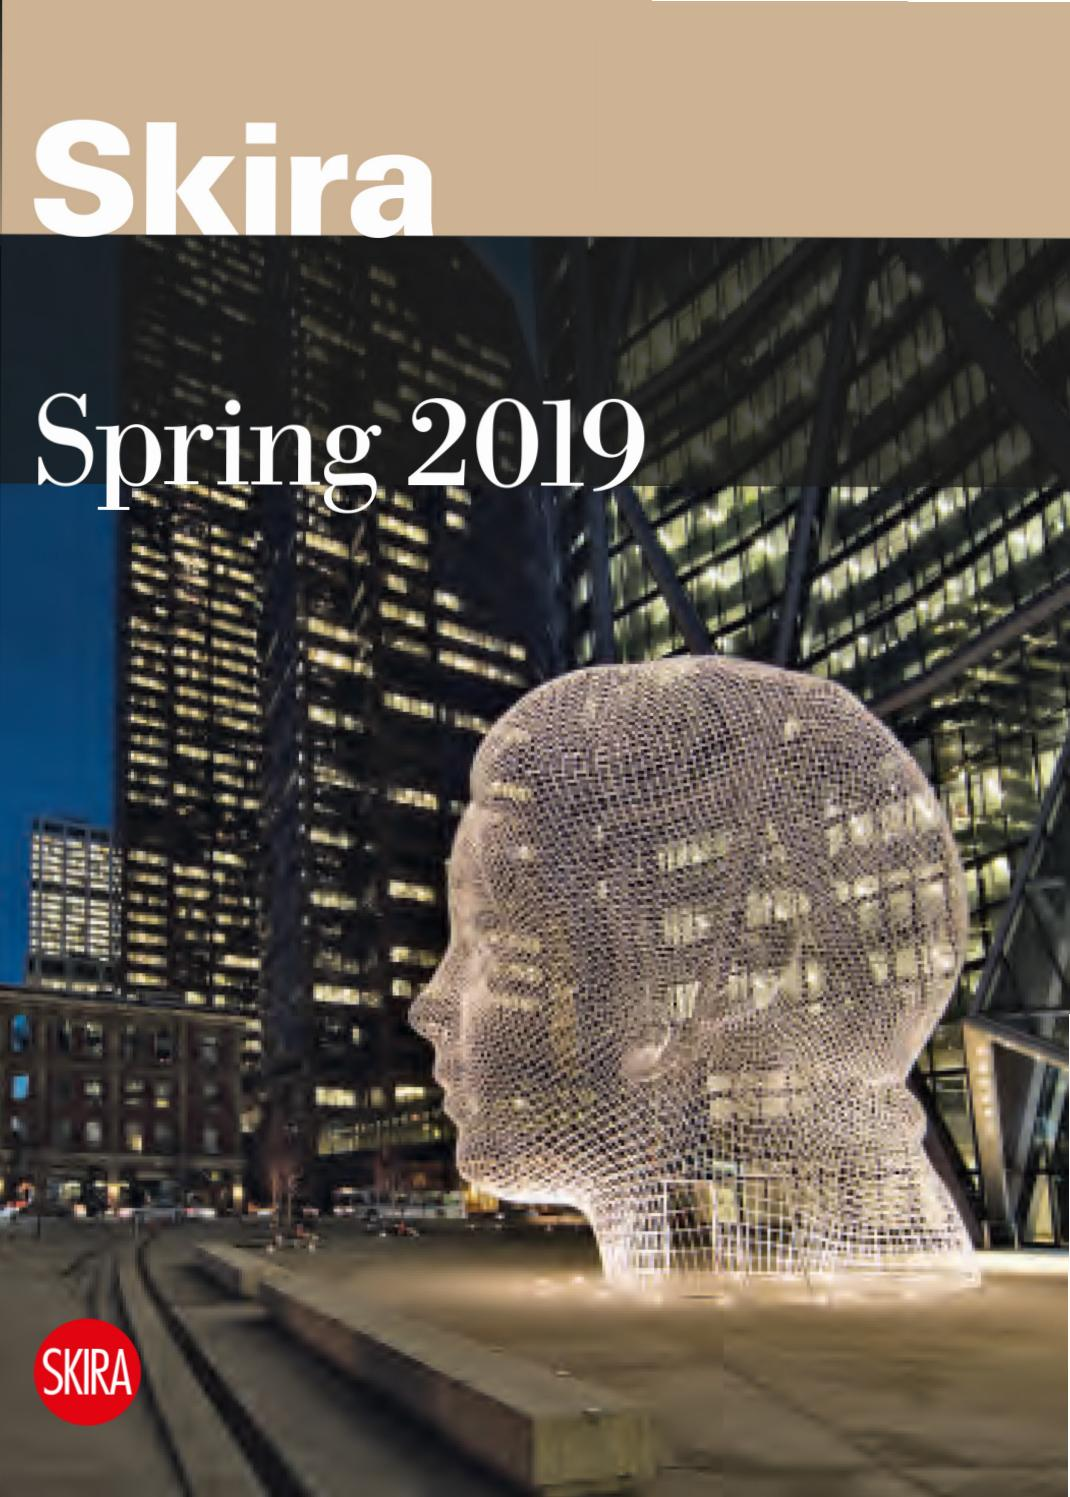 Abp 656 spring 2019skira editore - issuu